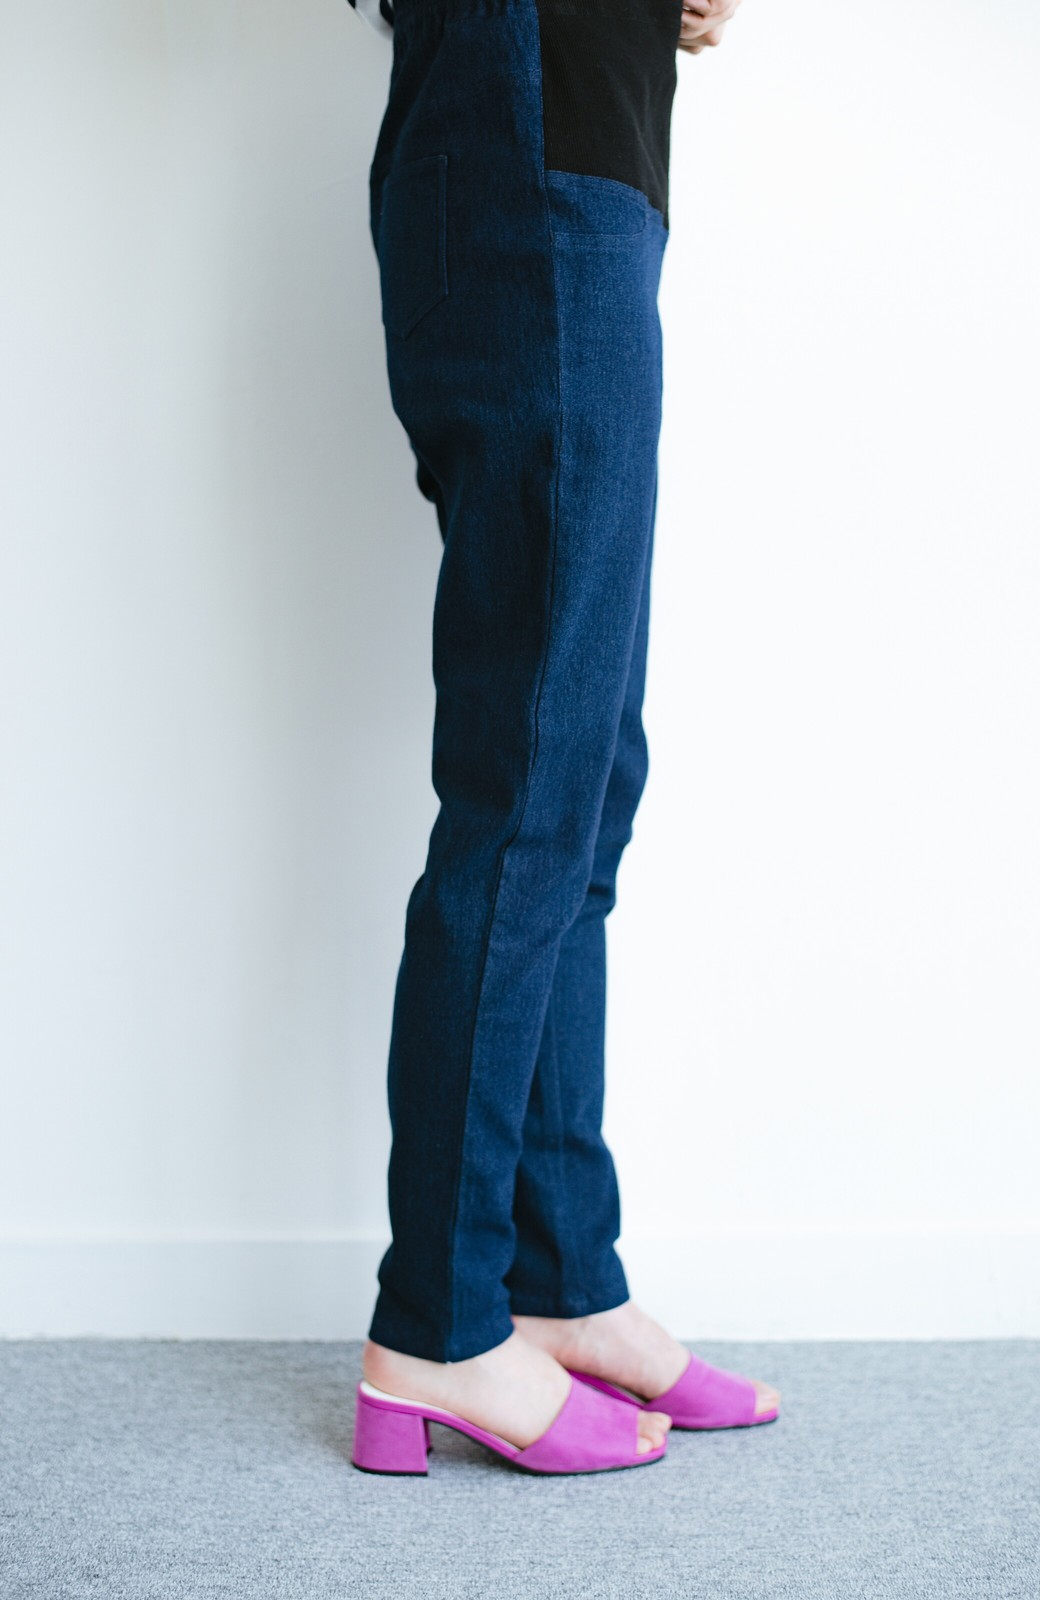 haco! おなかあったか安心感スキニーパンツ【ブルー期】女の子バンザイ!プロジェクト <ダークインディゴブルー>の商品写真10